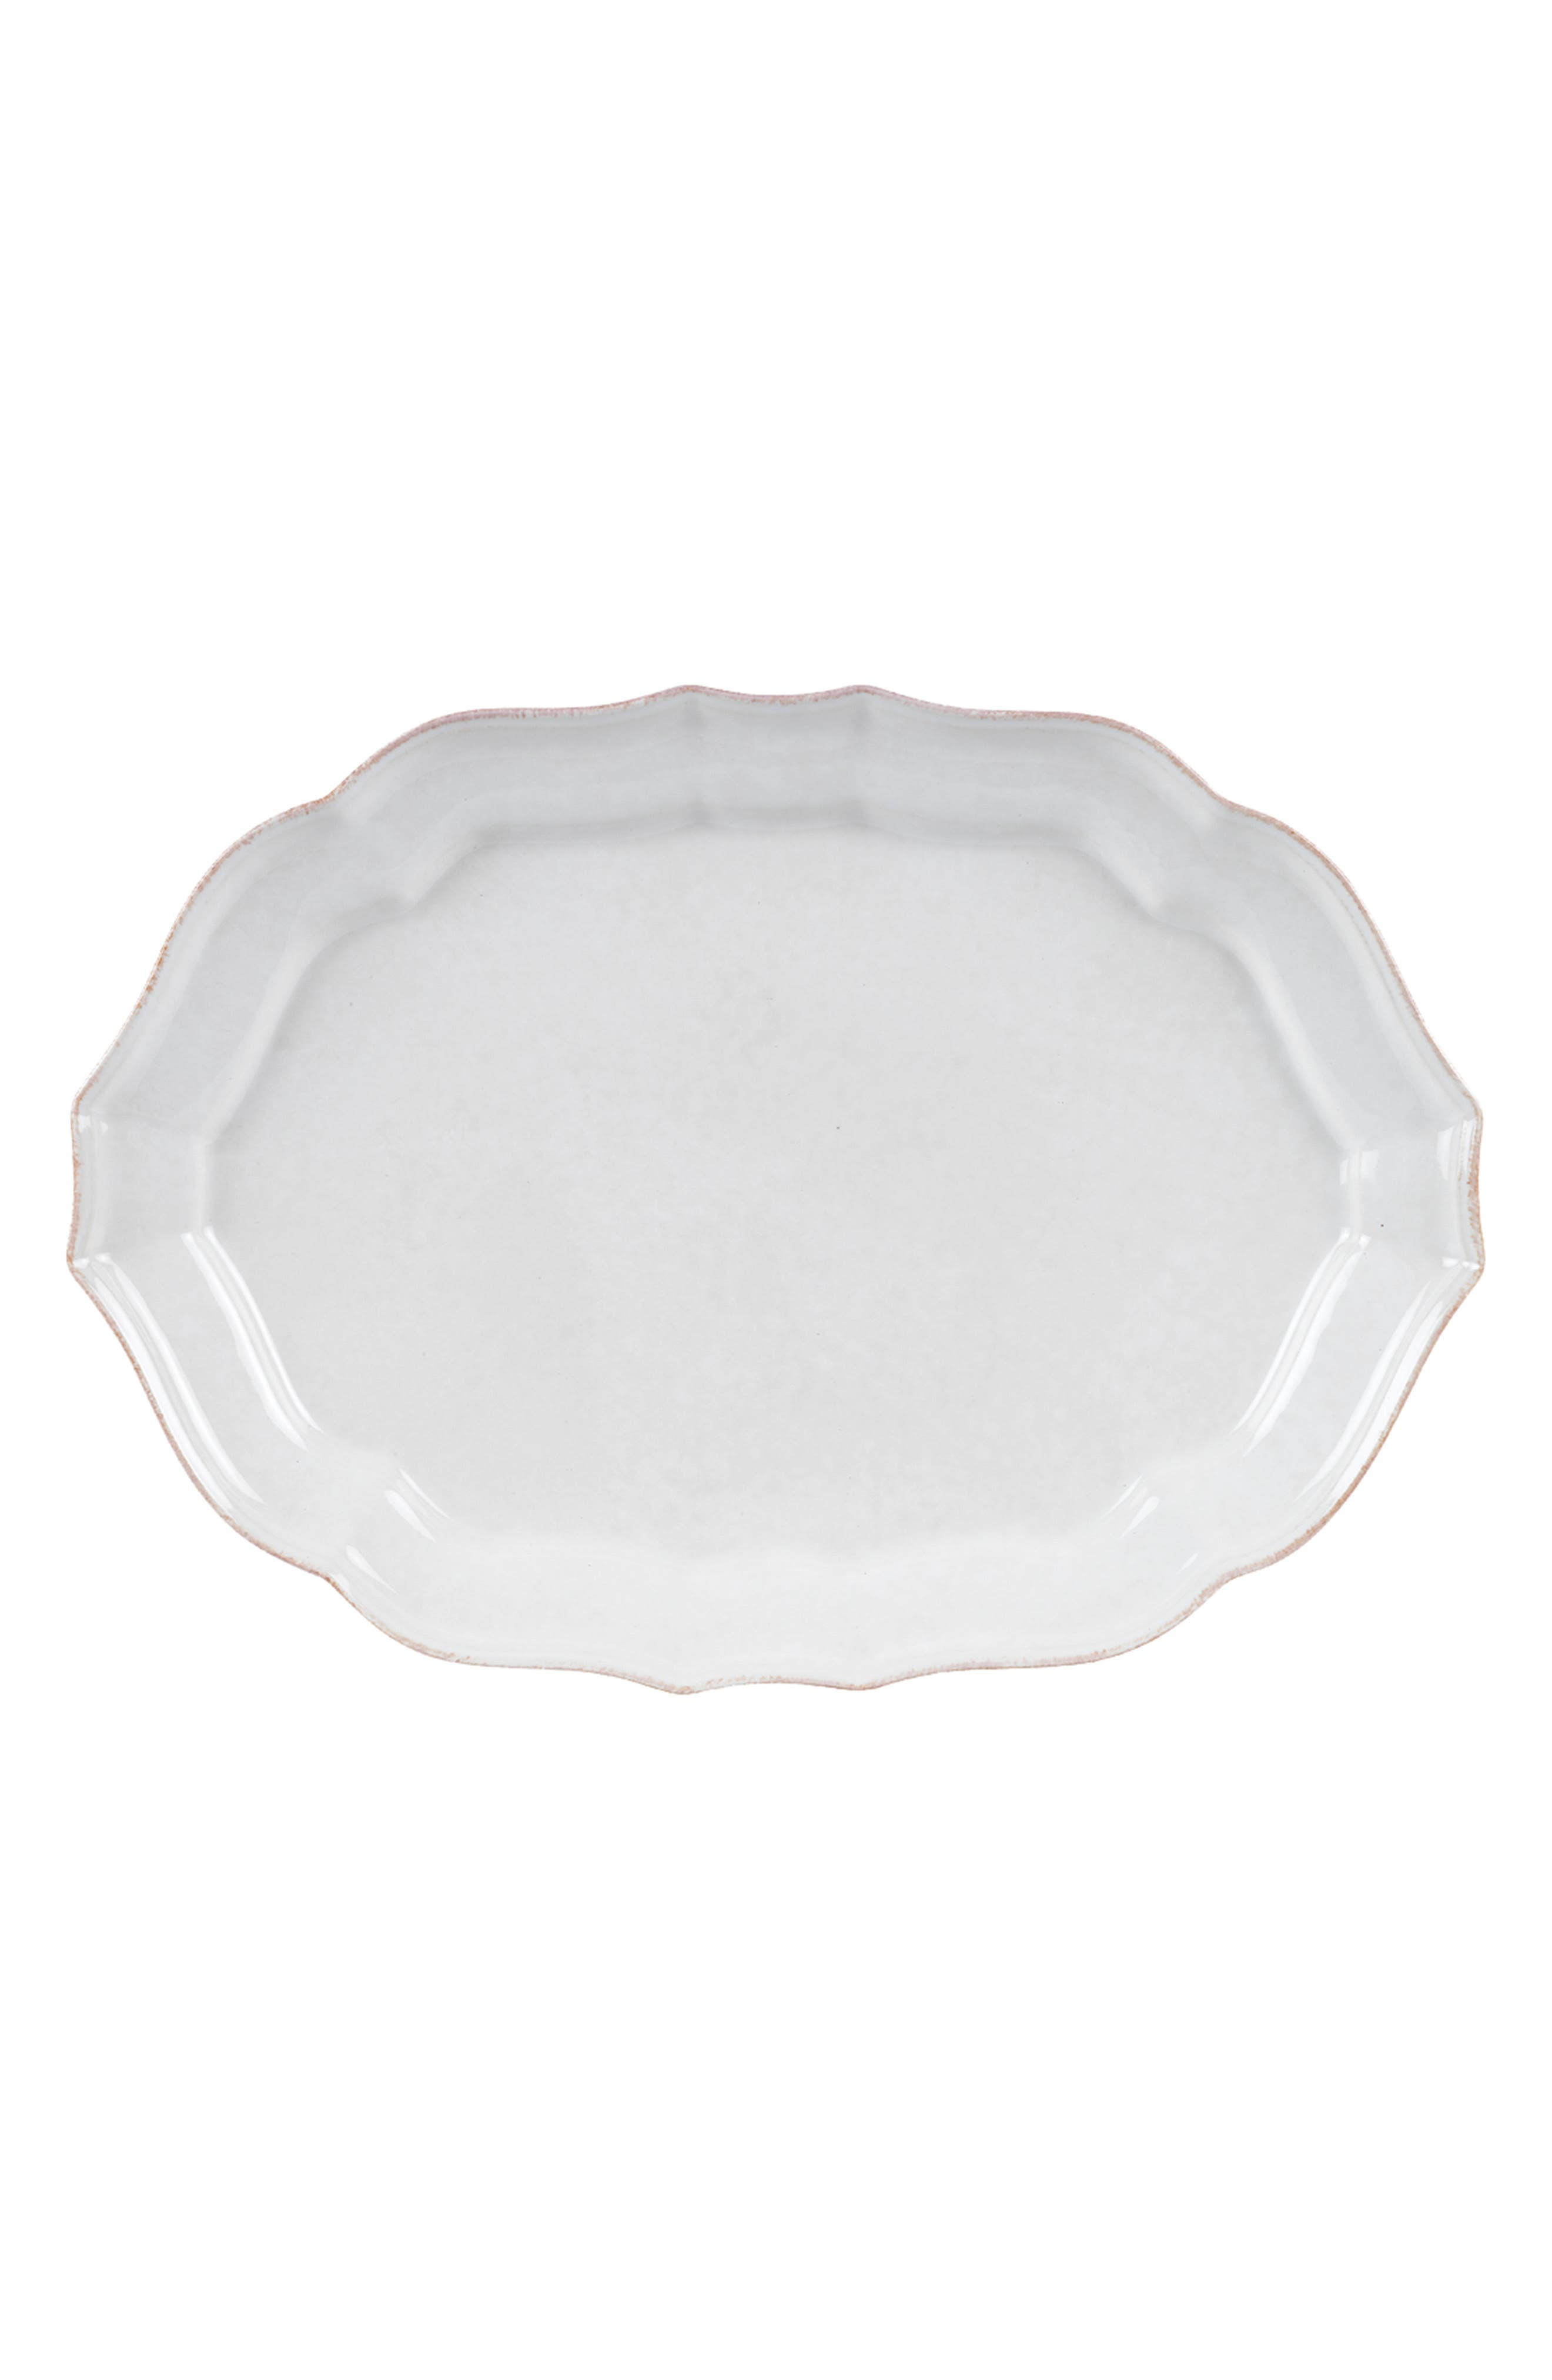 CASAFINA Impressions Large Oval Platter, Main, color, WHITE